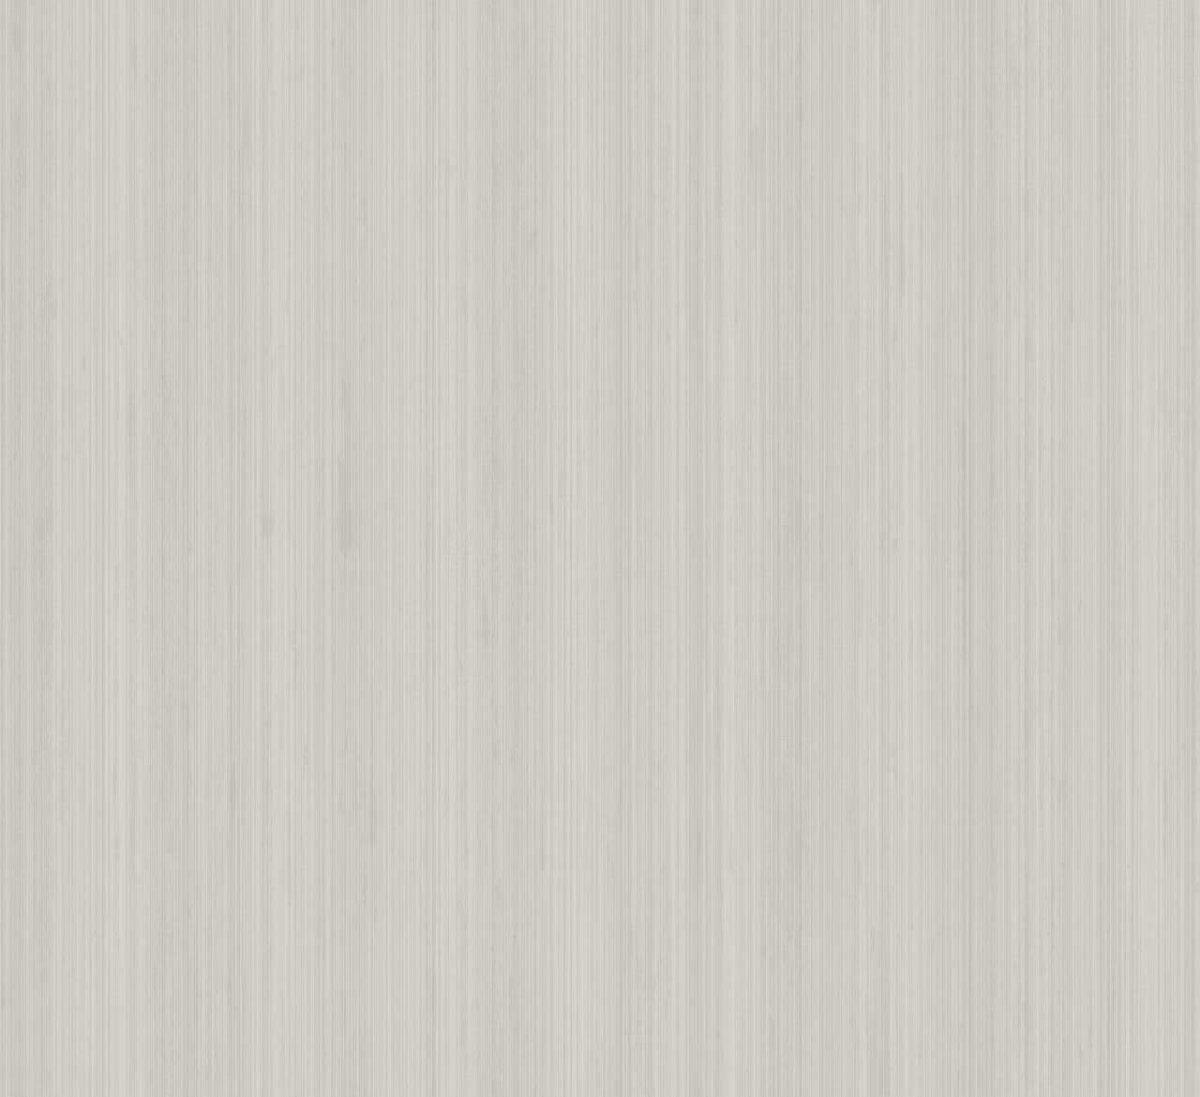 Capri-Luxury-Wallpaper-CP00739-Silk-Texture